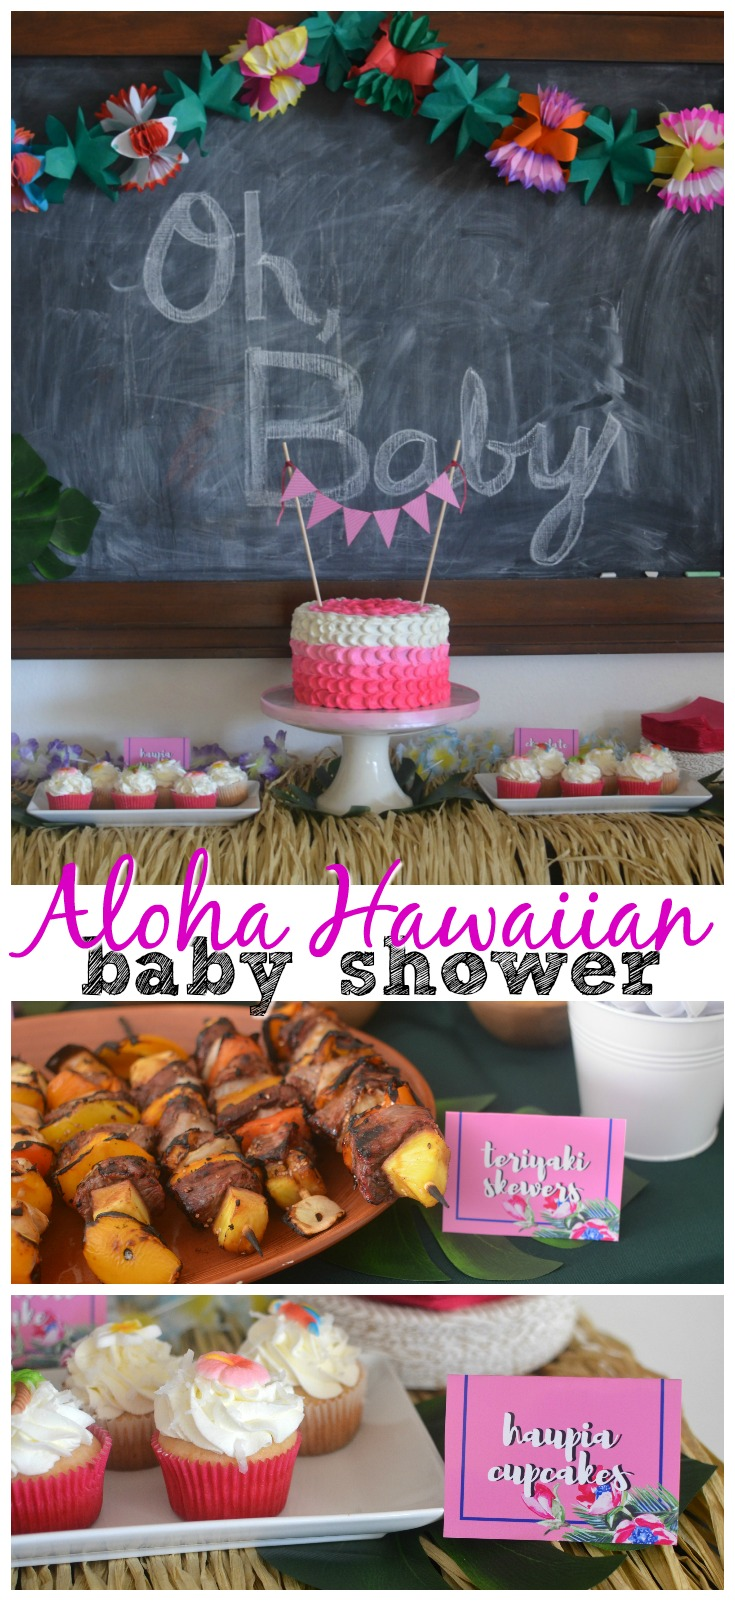 aloha-hawaiian-baby-shower